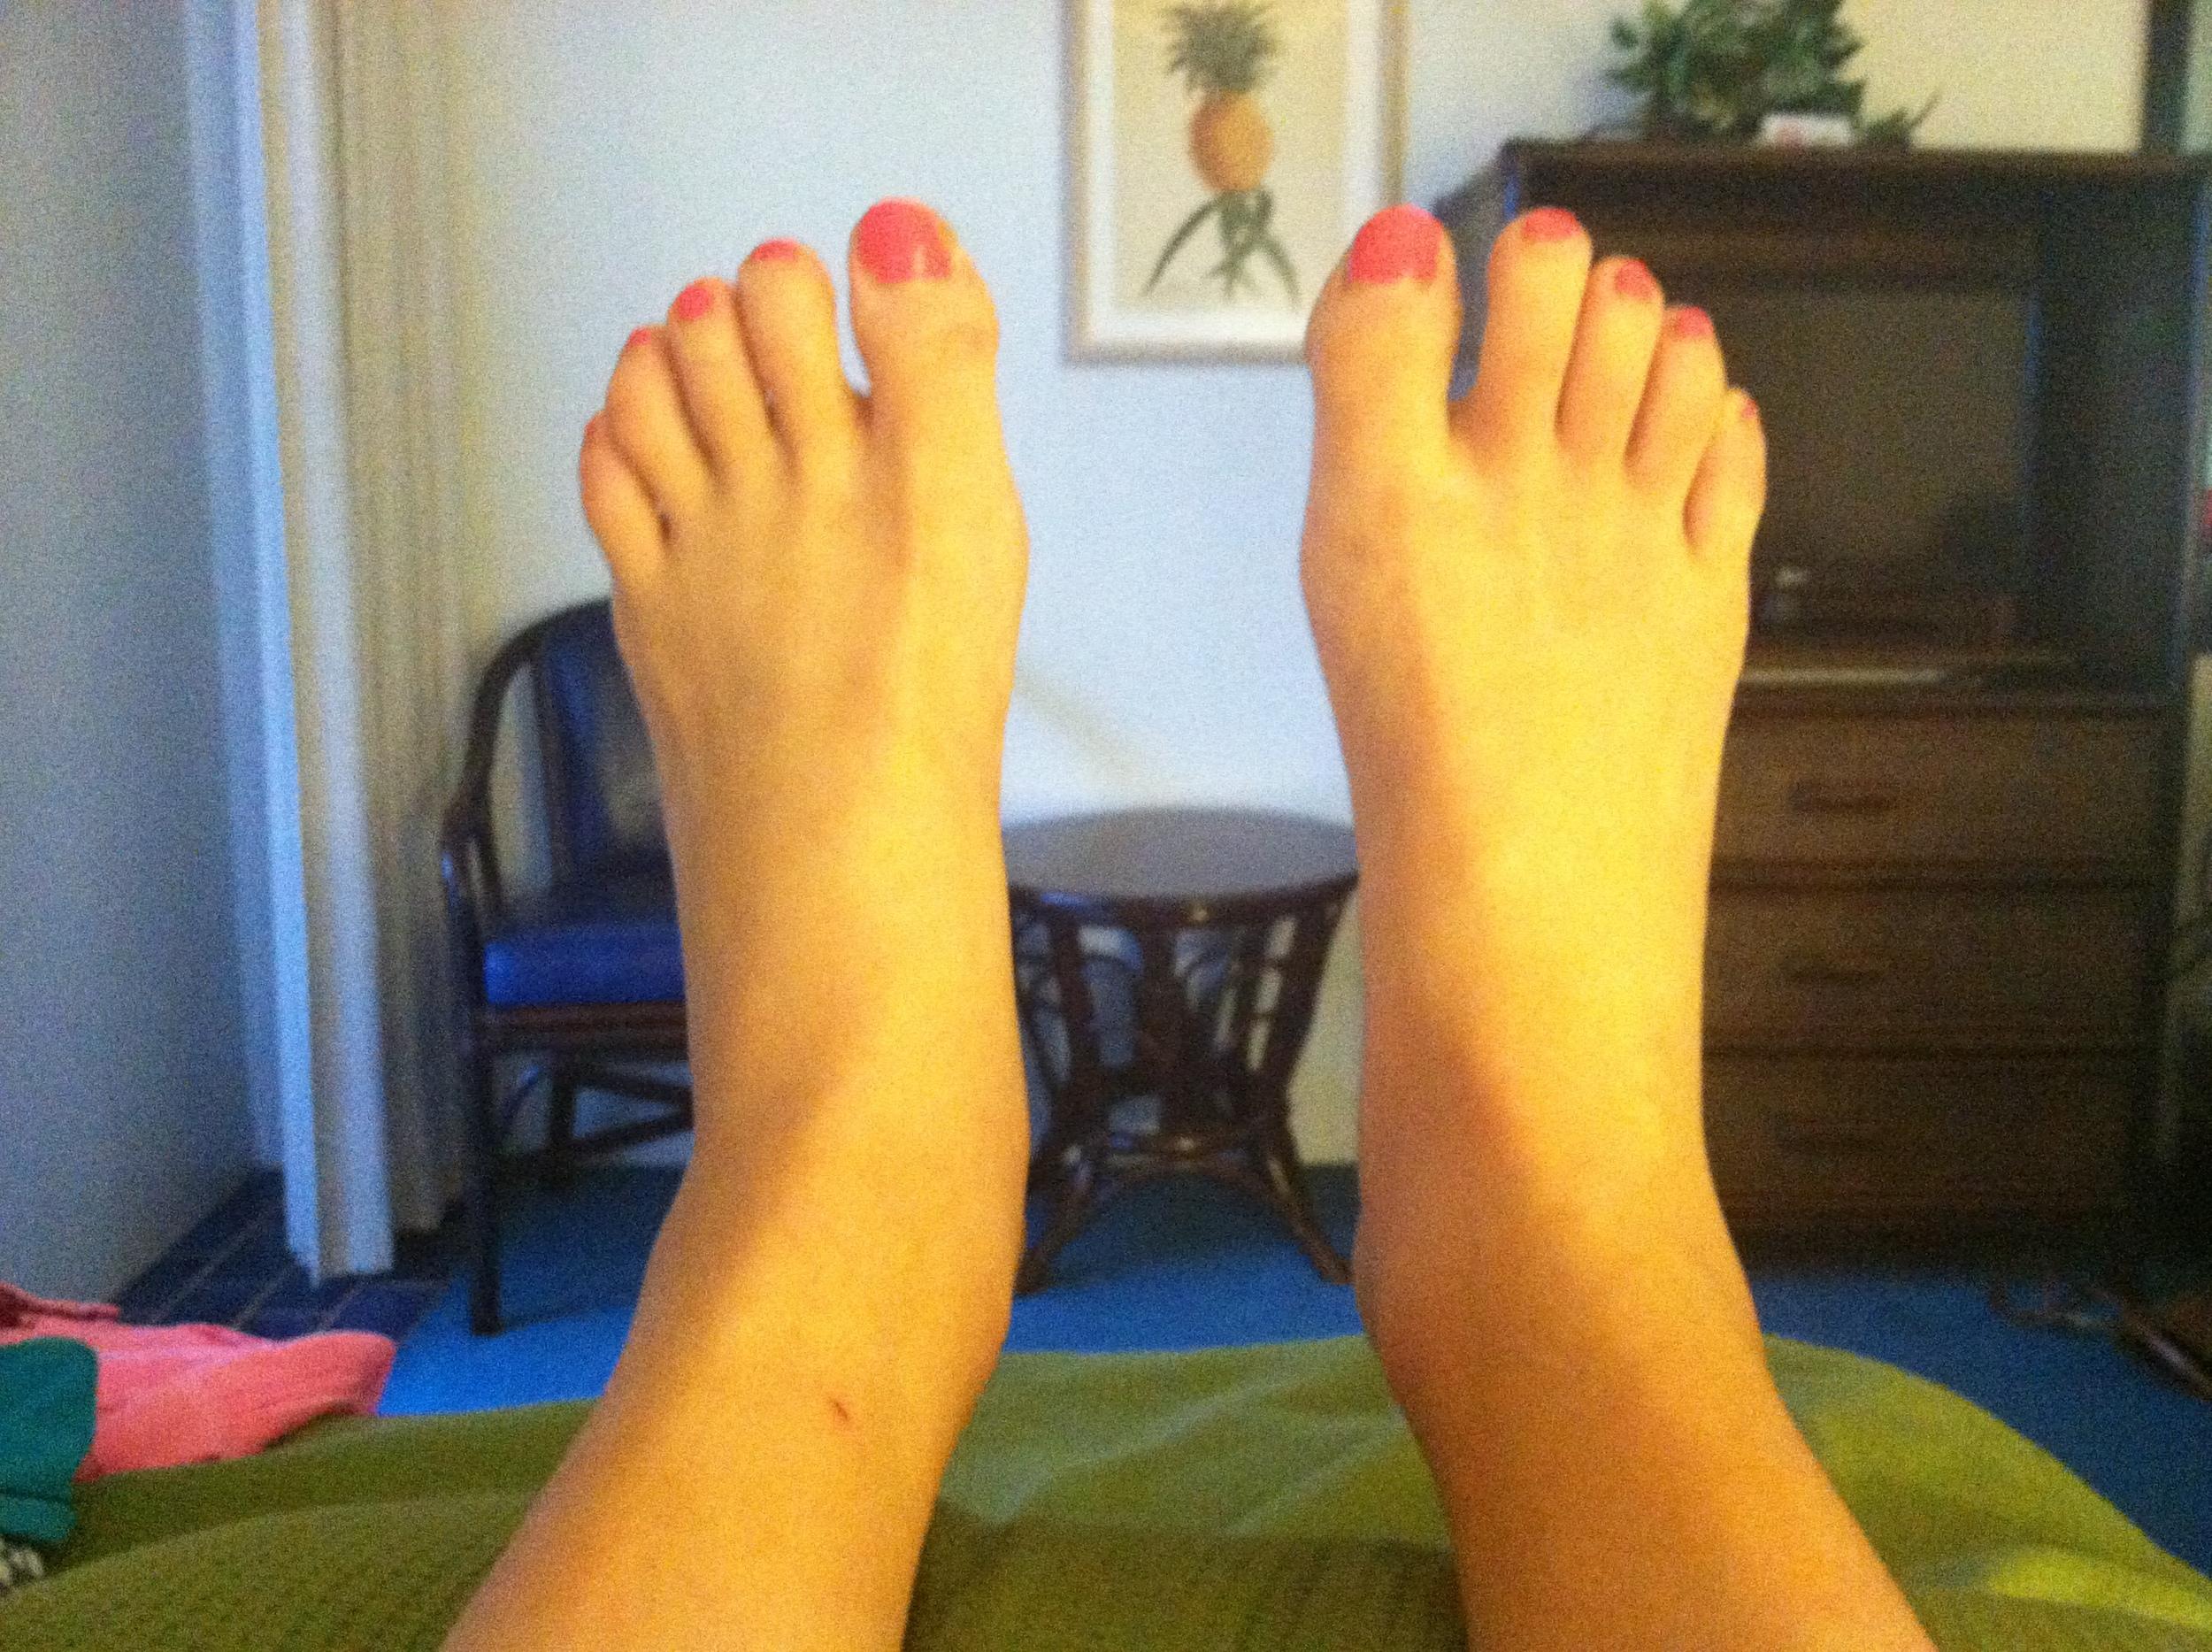 Big, swollen, sausage feet.